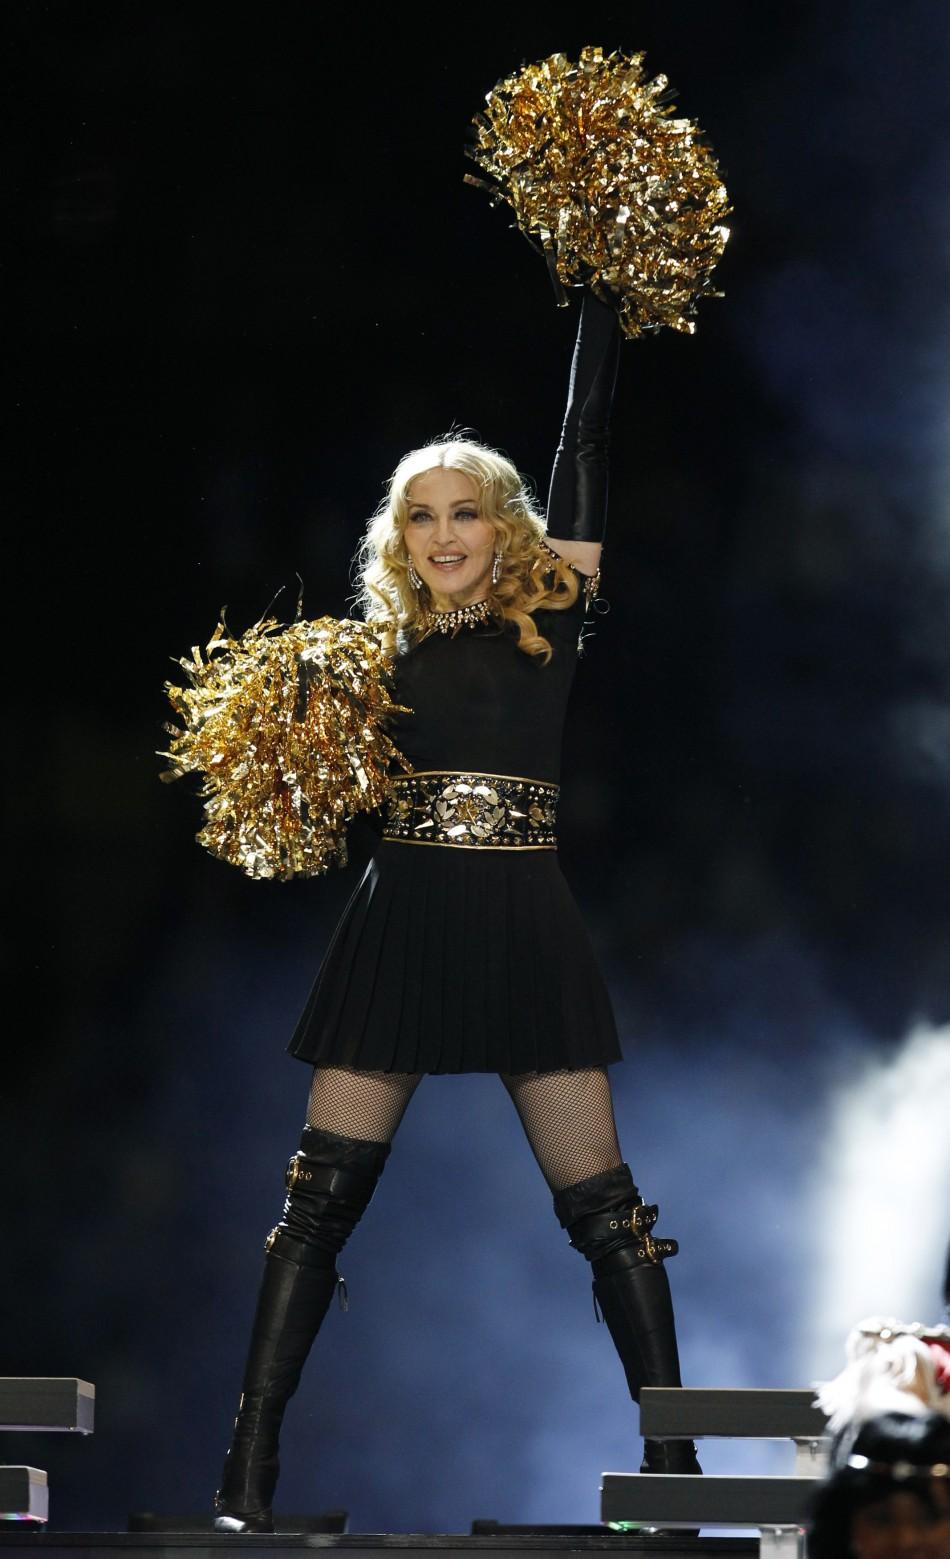 Madonna performing at the NFL Super Bowl